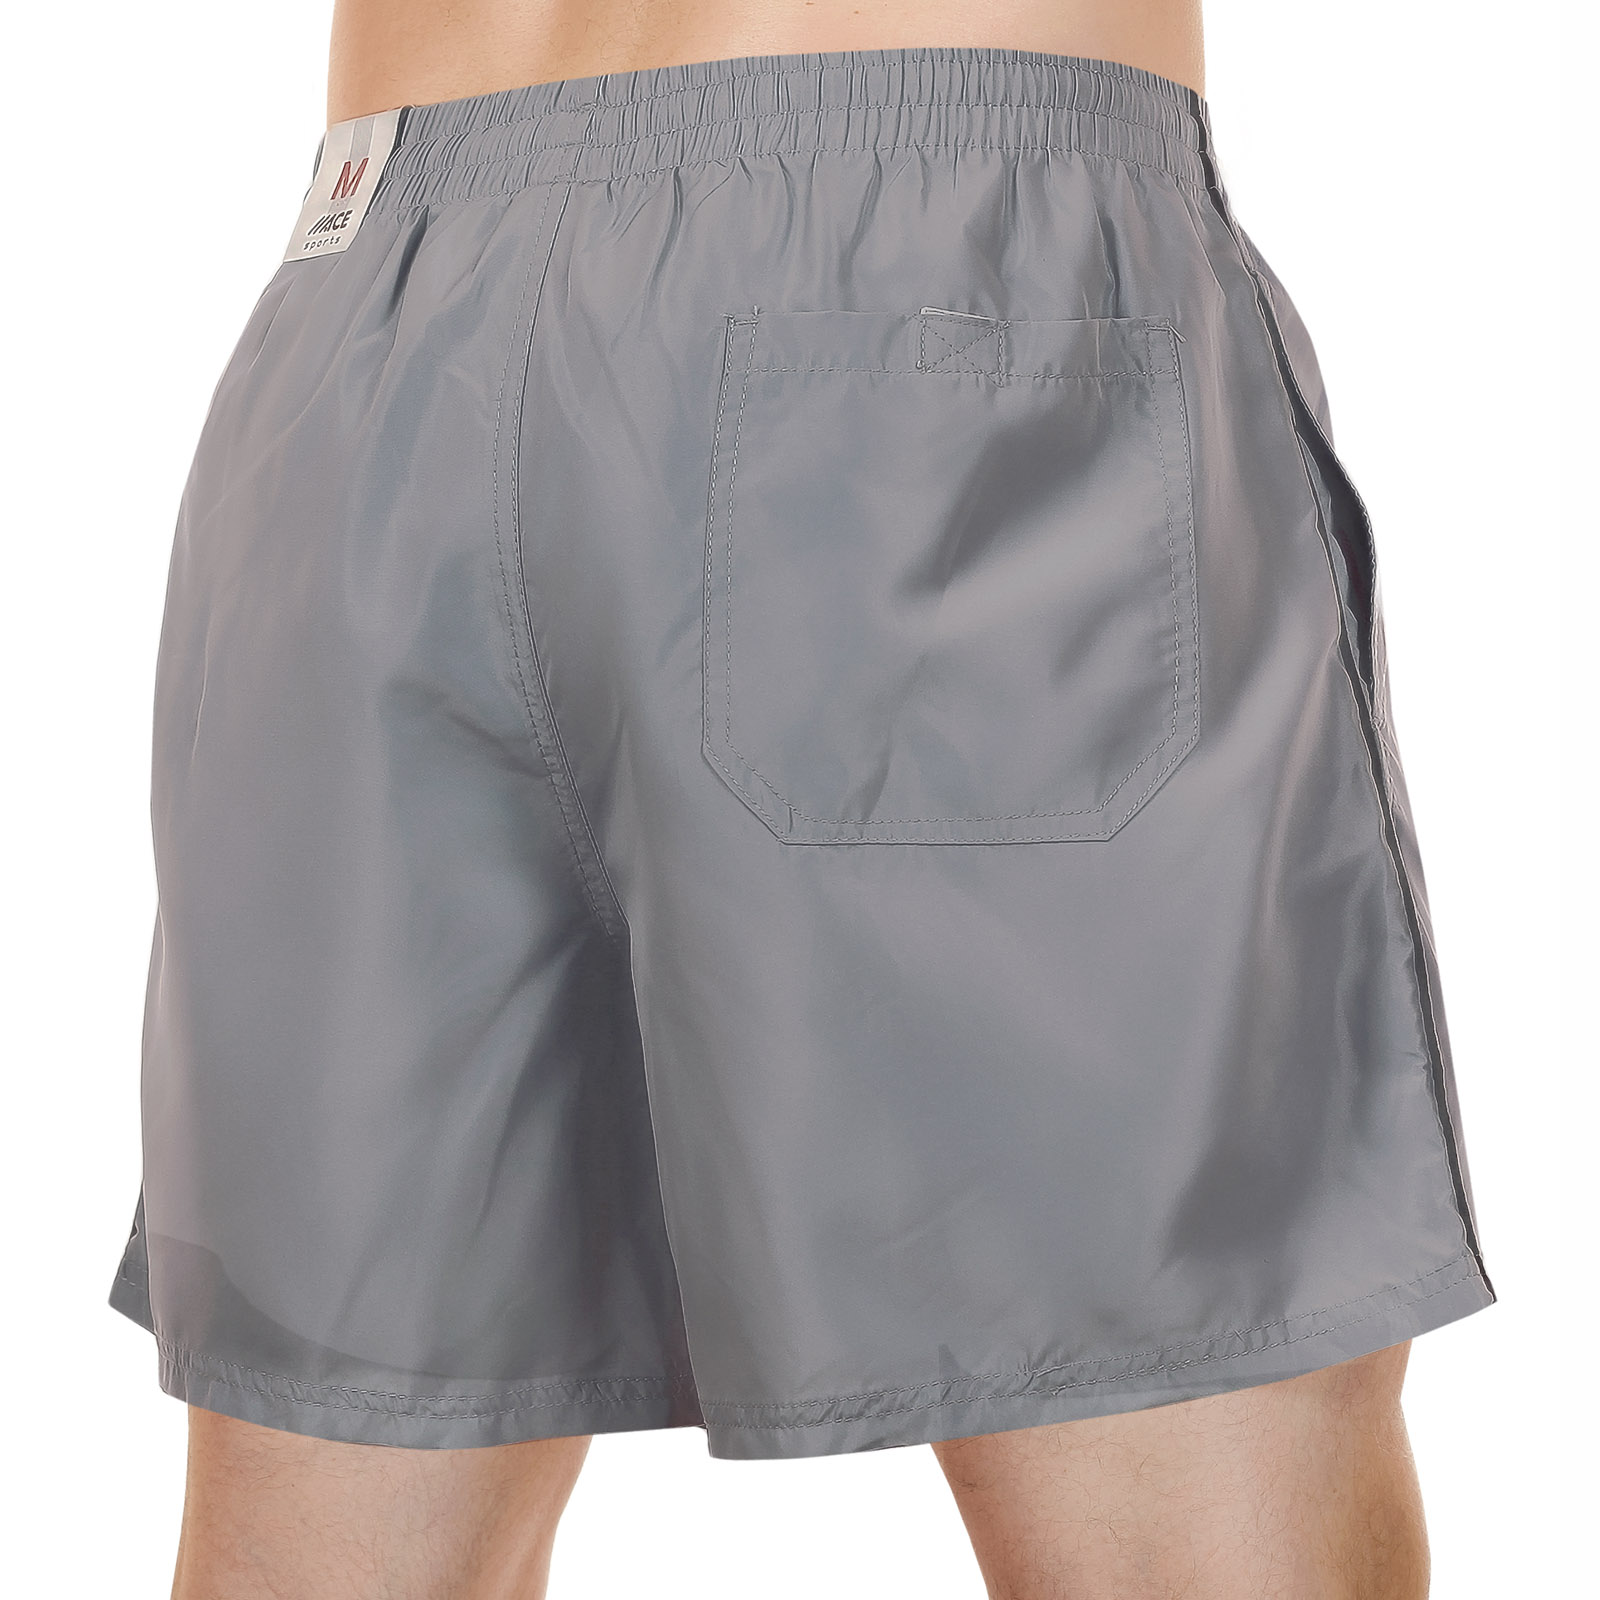 Короткие шорты от канадского бренда MACE по низкой цене